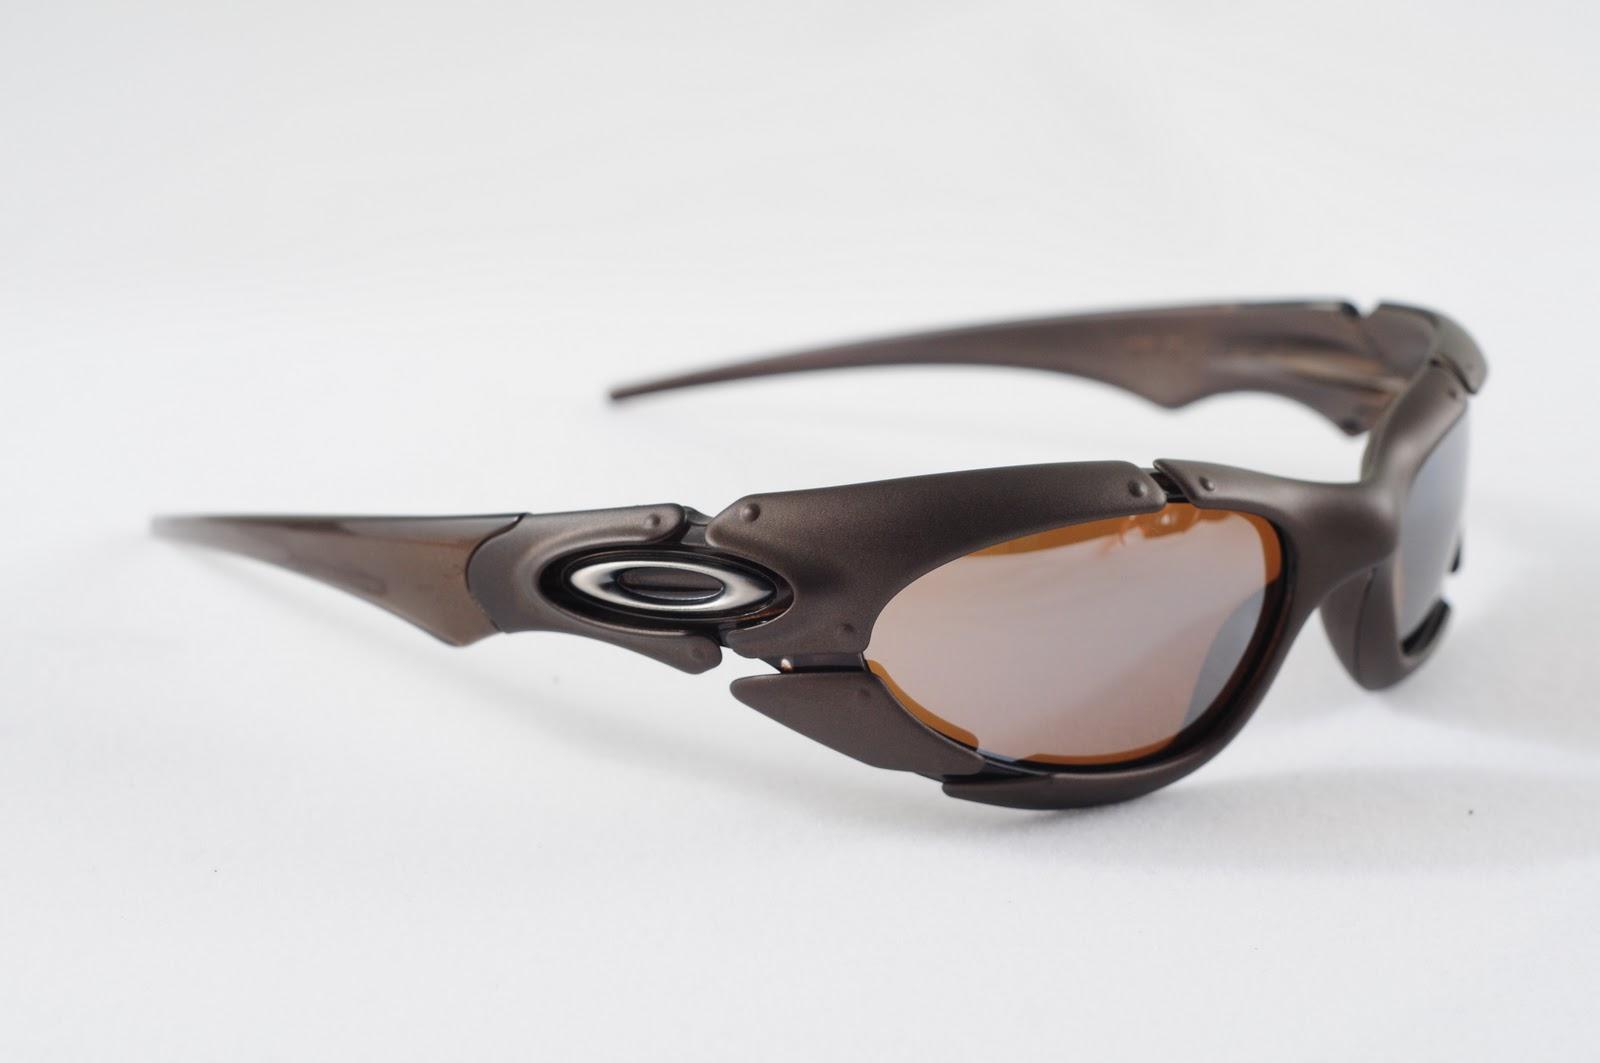 c1a1caf0d0 Oakley Plate Sunglasses Bronze « Heritage Malta